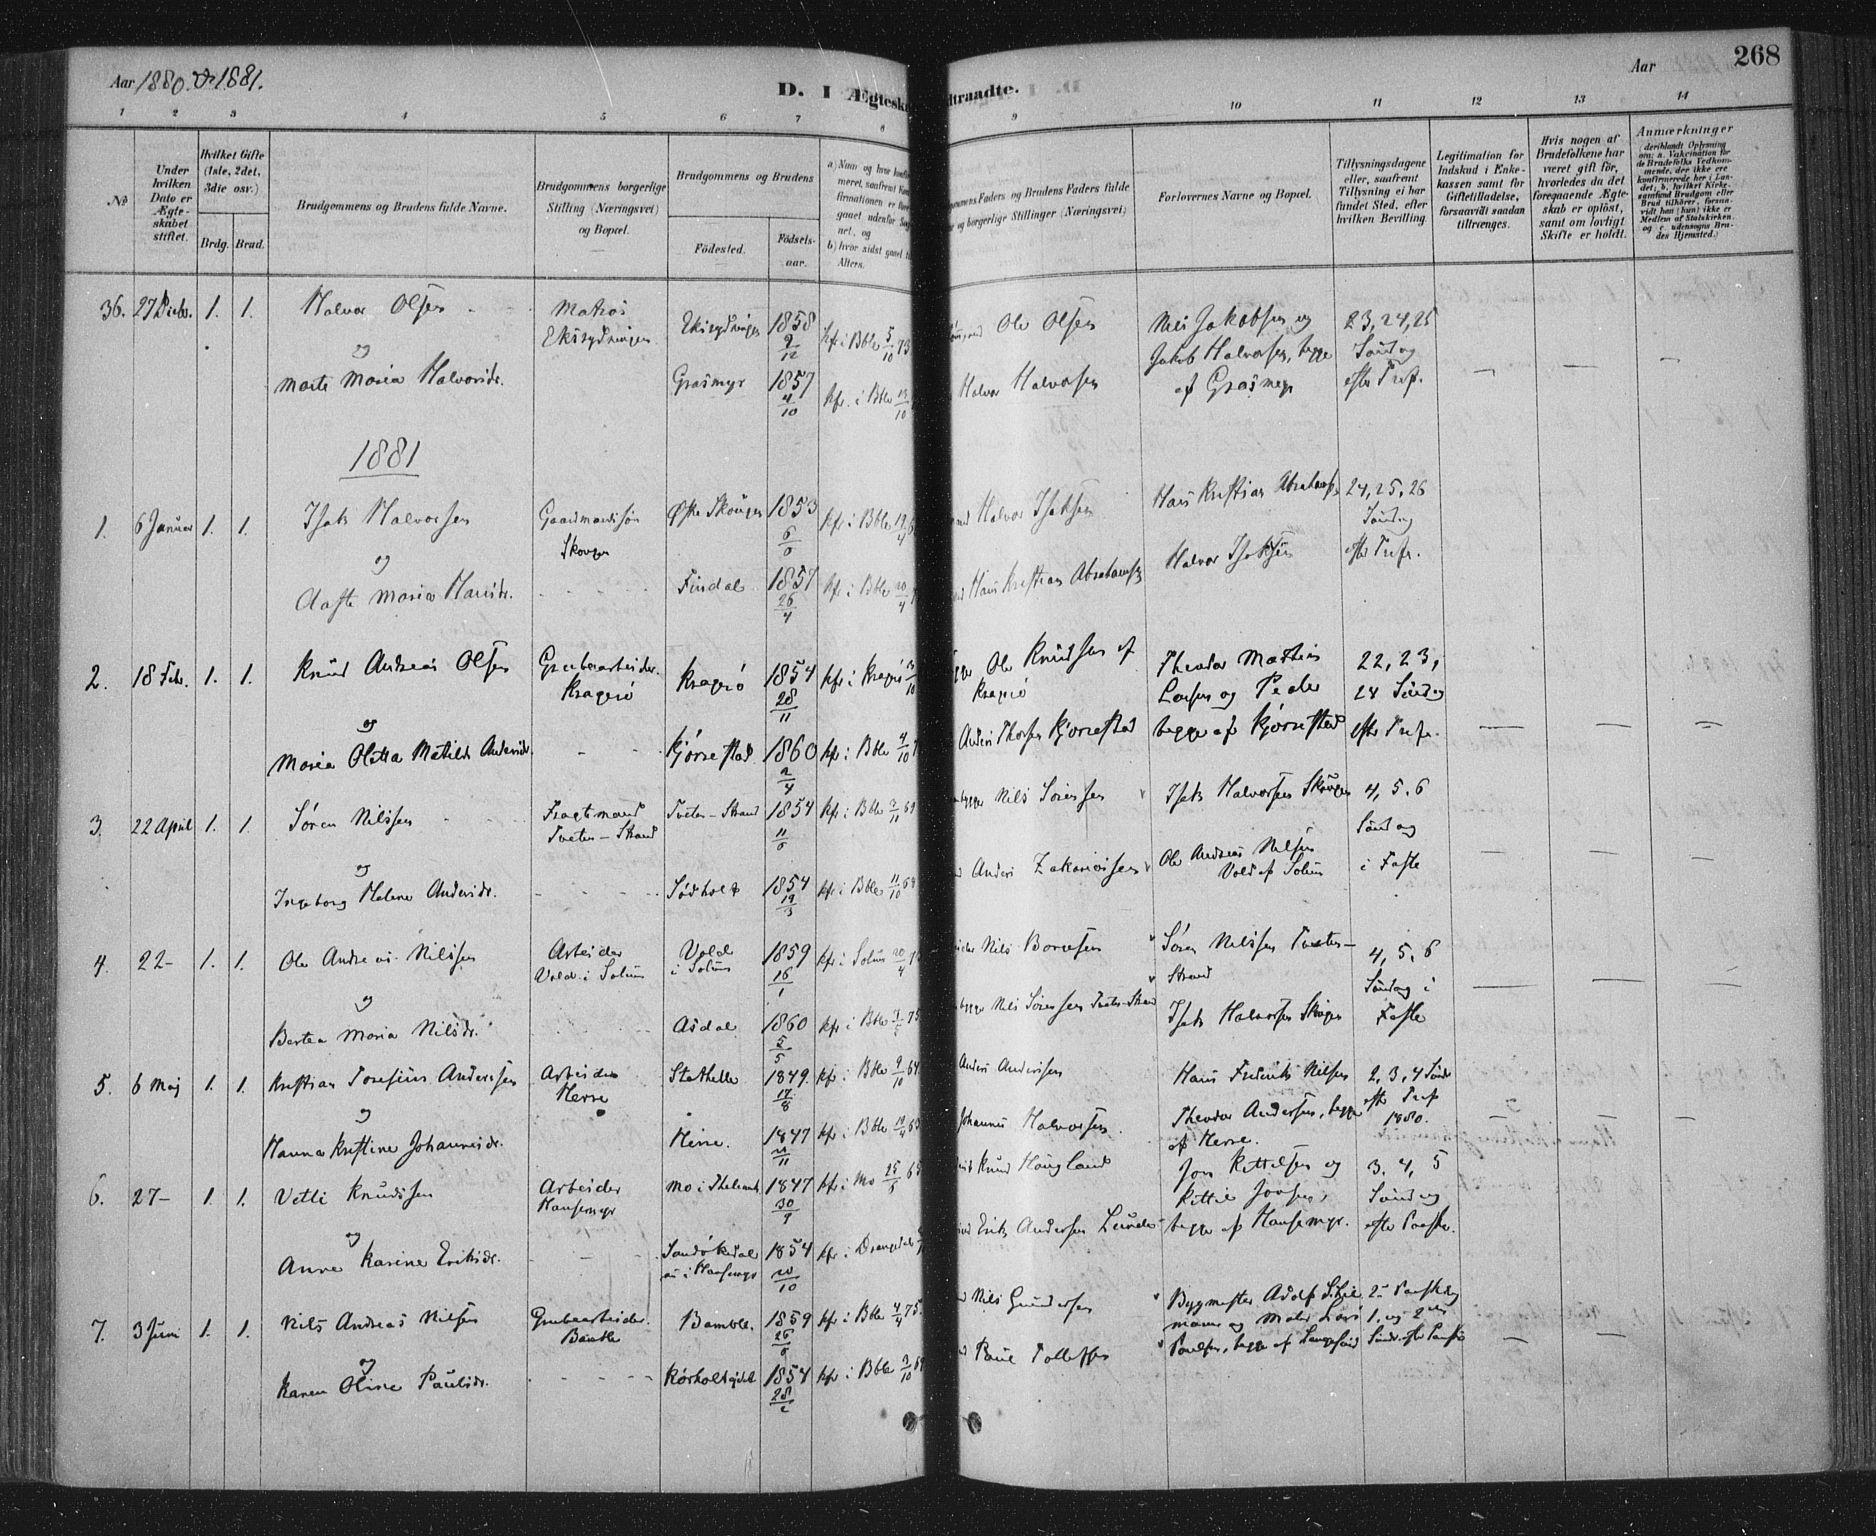 SAKO, Bamble kirkebøker, F/Fa/L0007: Ministerialbok nr. I 7, 1878-1888, s. 268